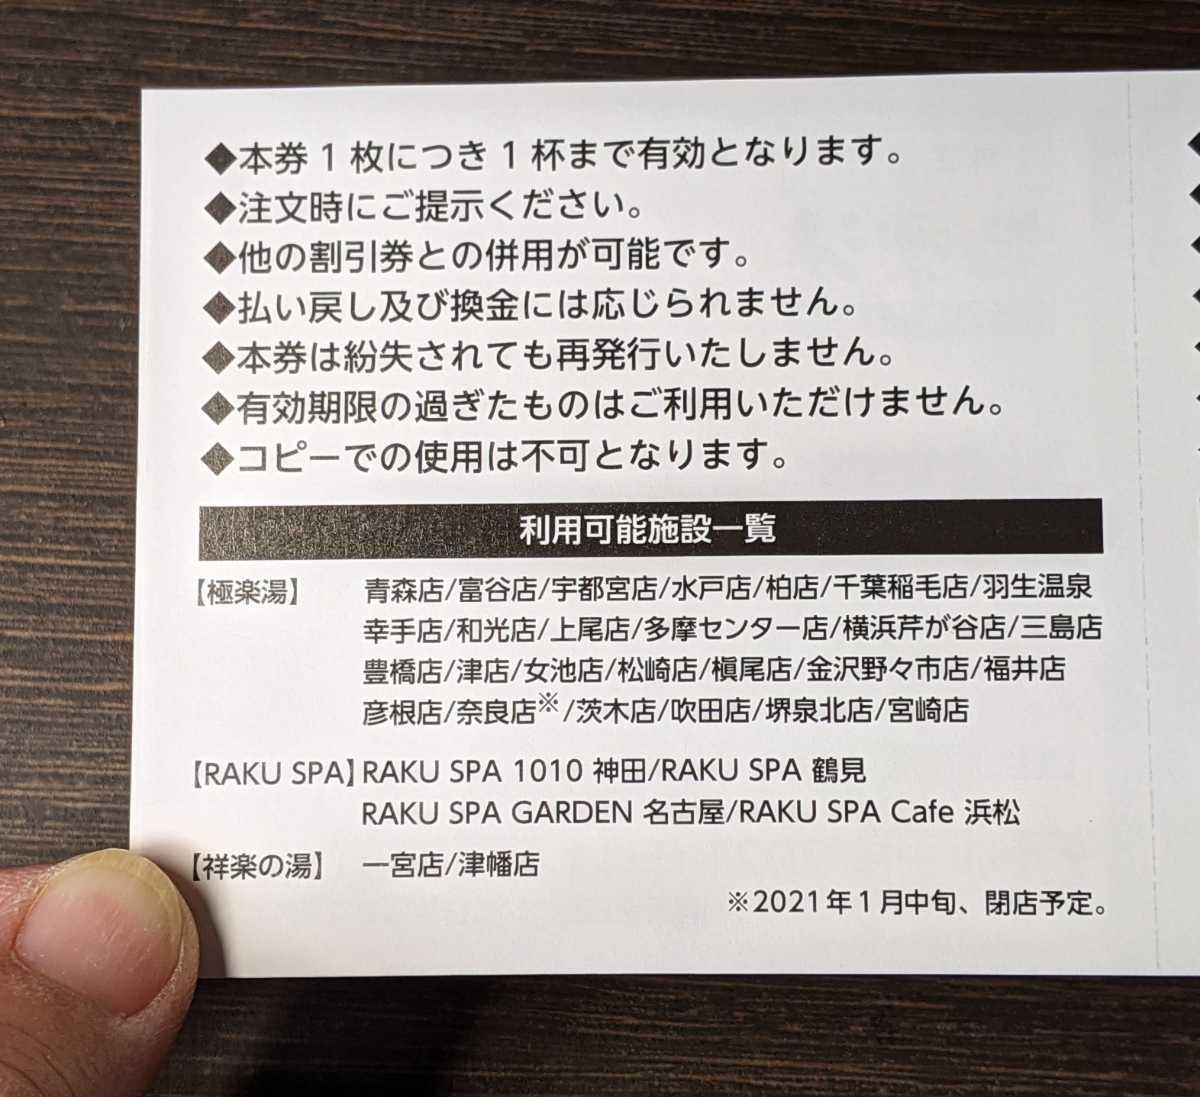 極楽湯株主優待券6枚+ドリンク無料券2枚 有効期限2021年11月30日_画像3